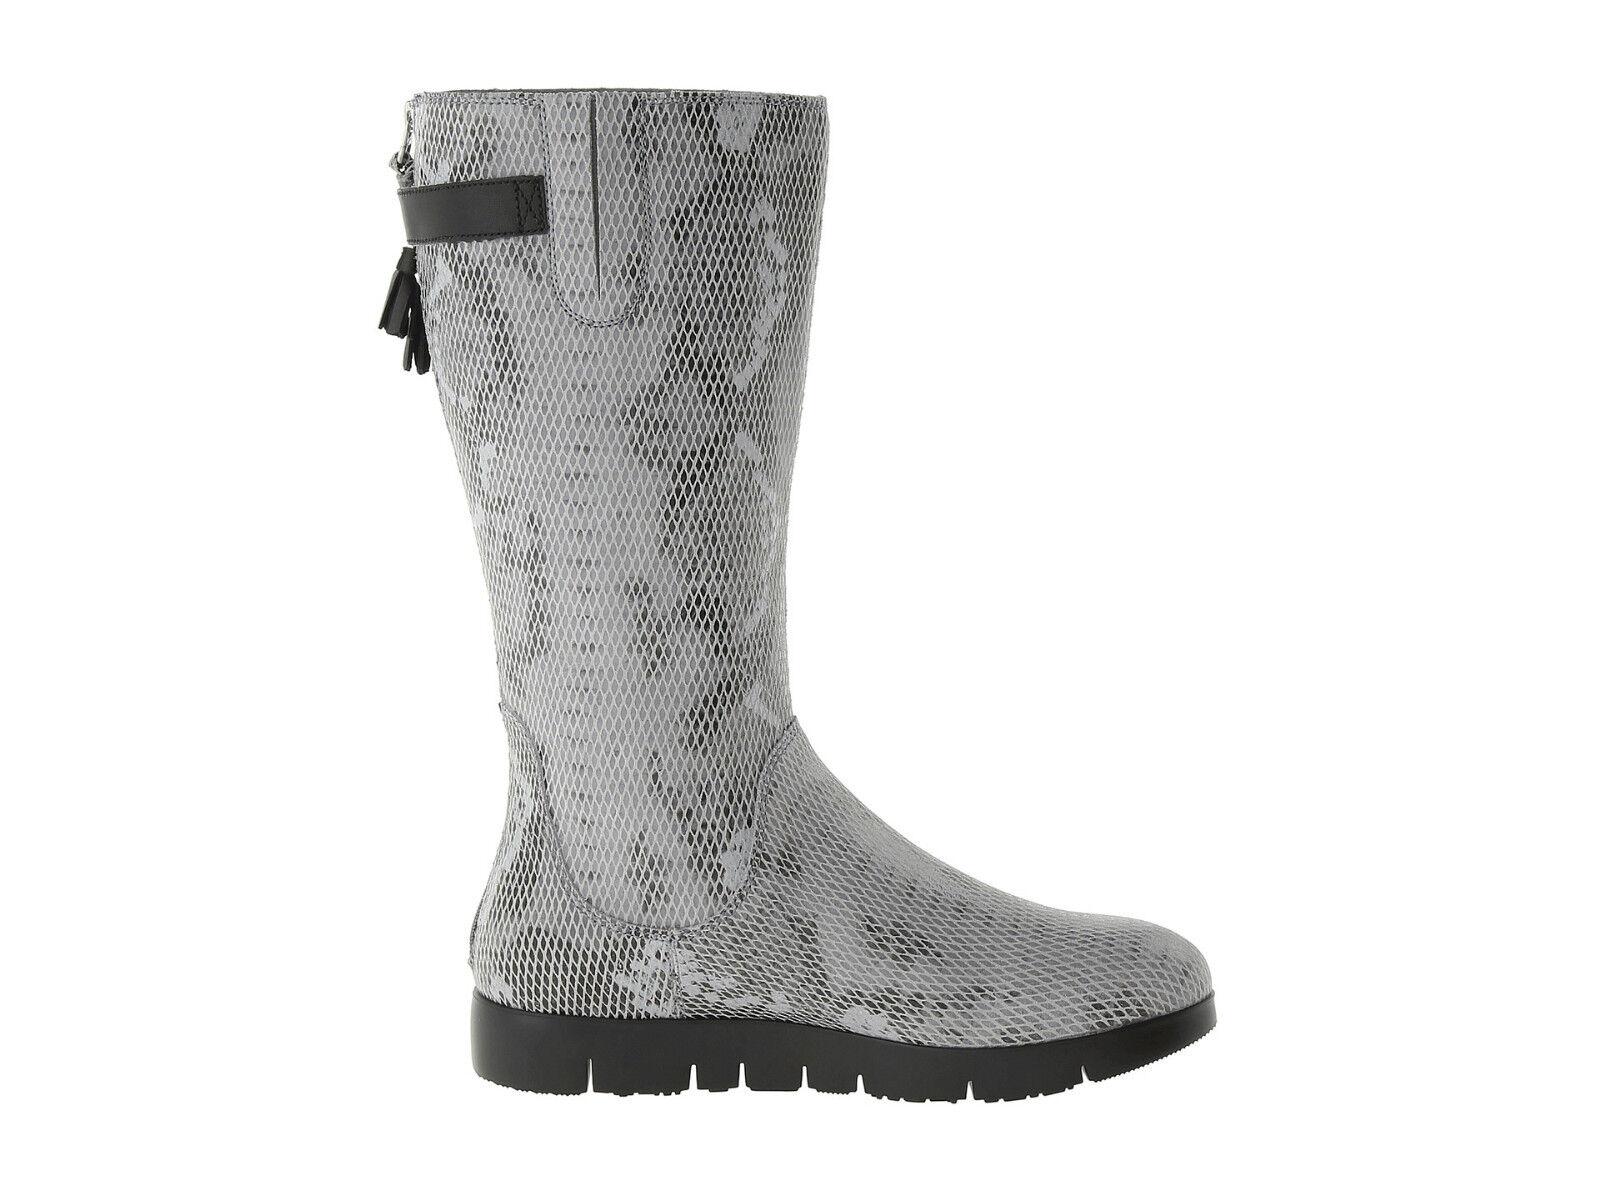 New Tsubo EILIS SNAKE Women Boots Size US 6 / EU37 (MSRP 295)